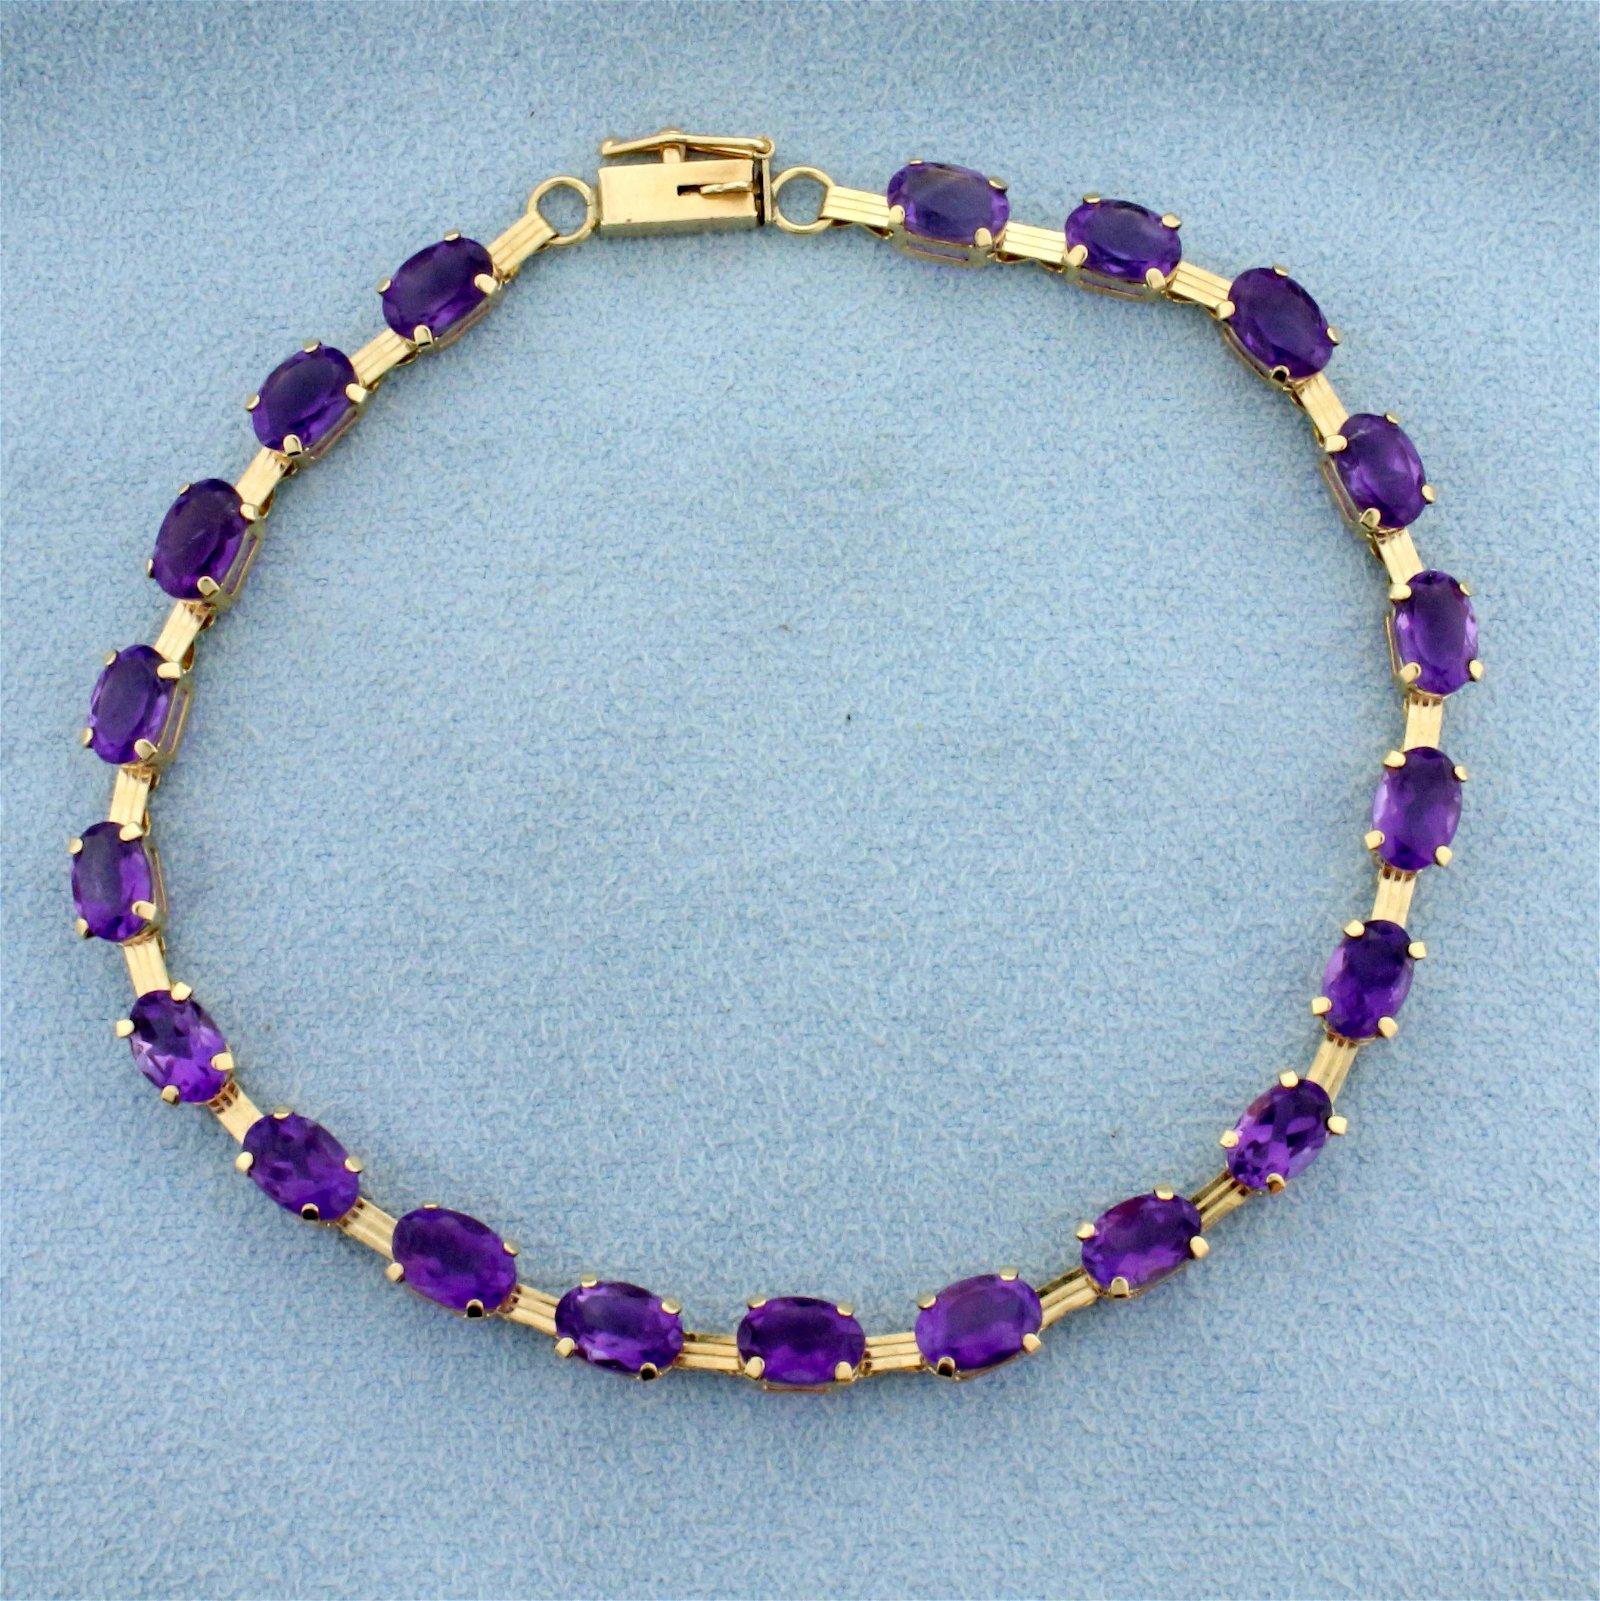 10ct TW Amethyst Line Bracelet in 10K Yellow Gold